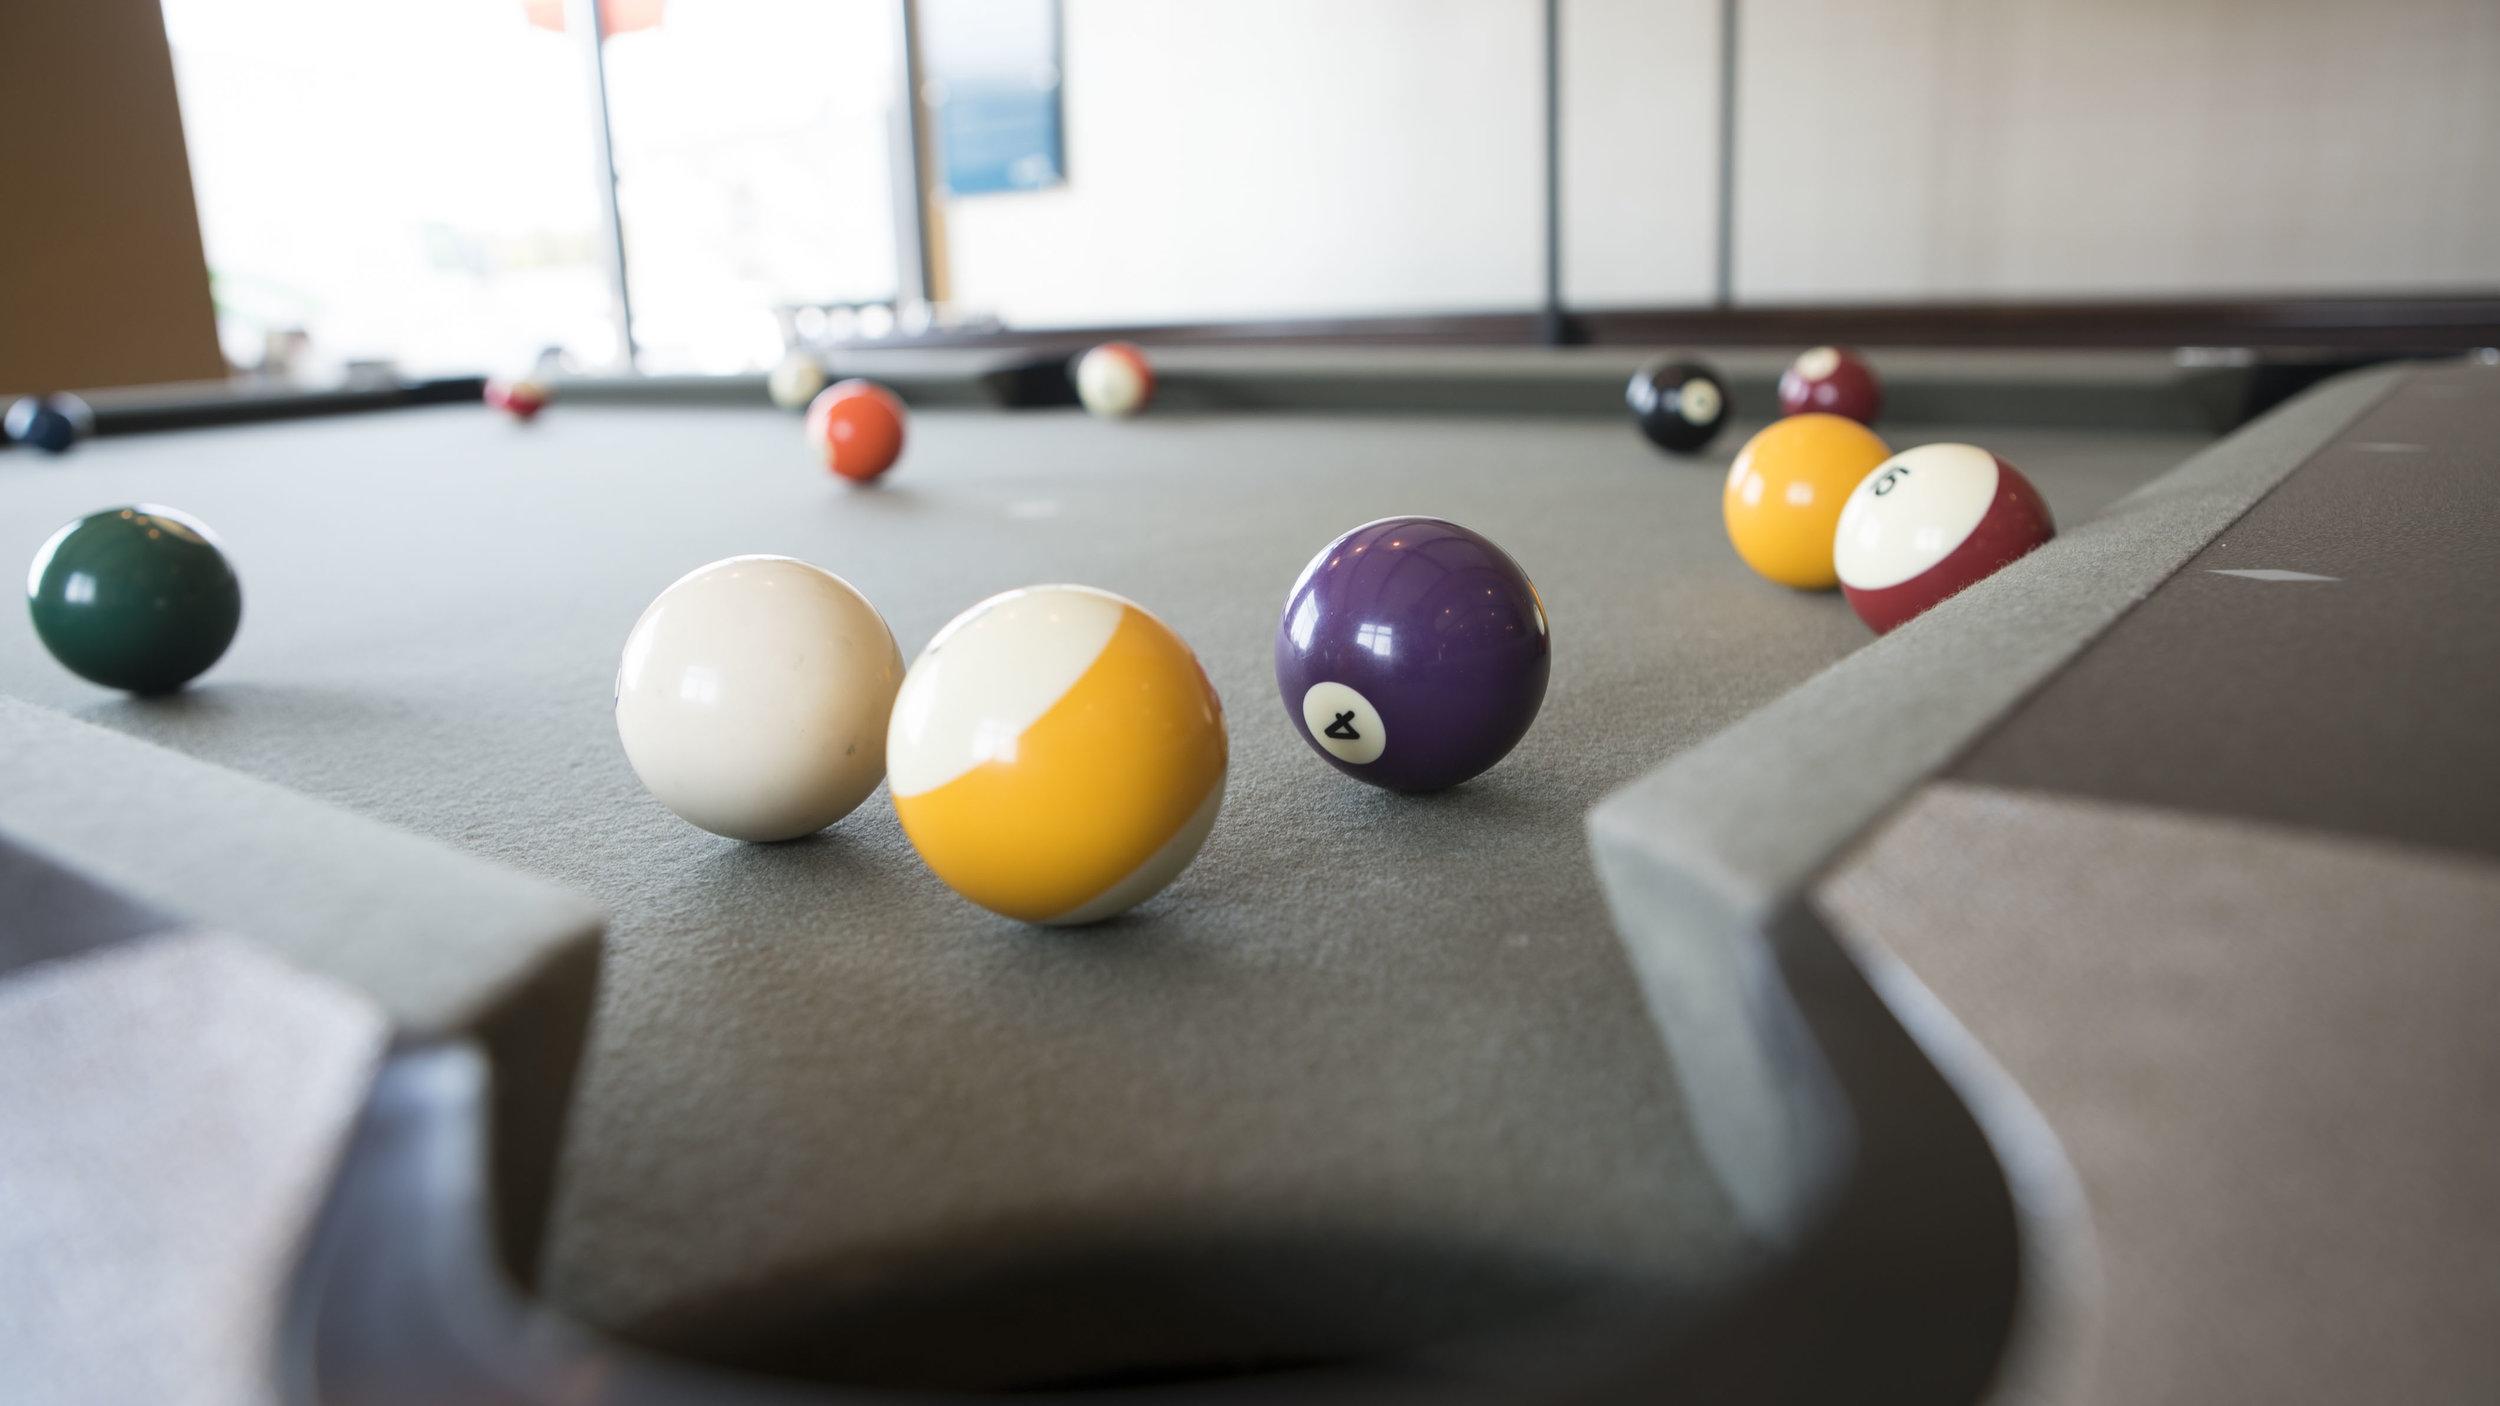 11-Become a Billiards Master.jpg